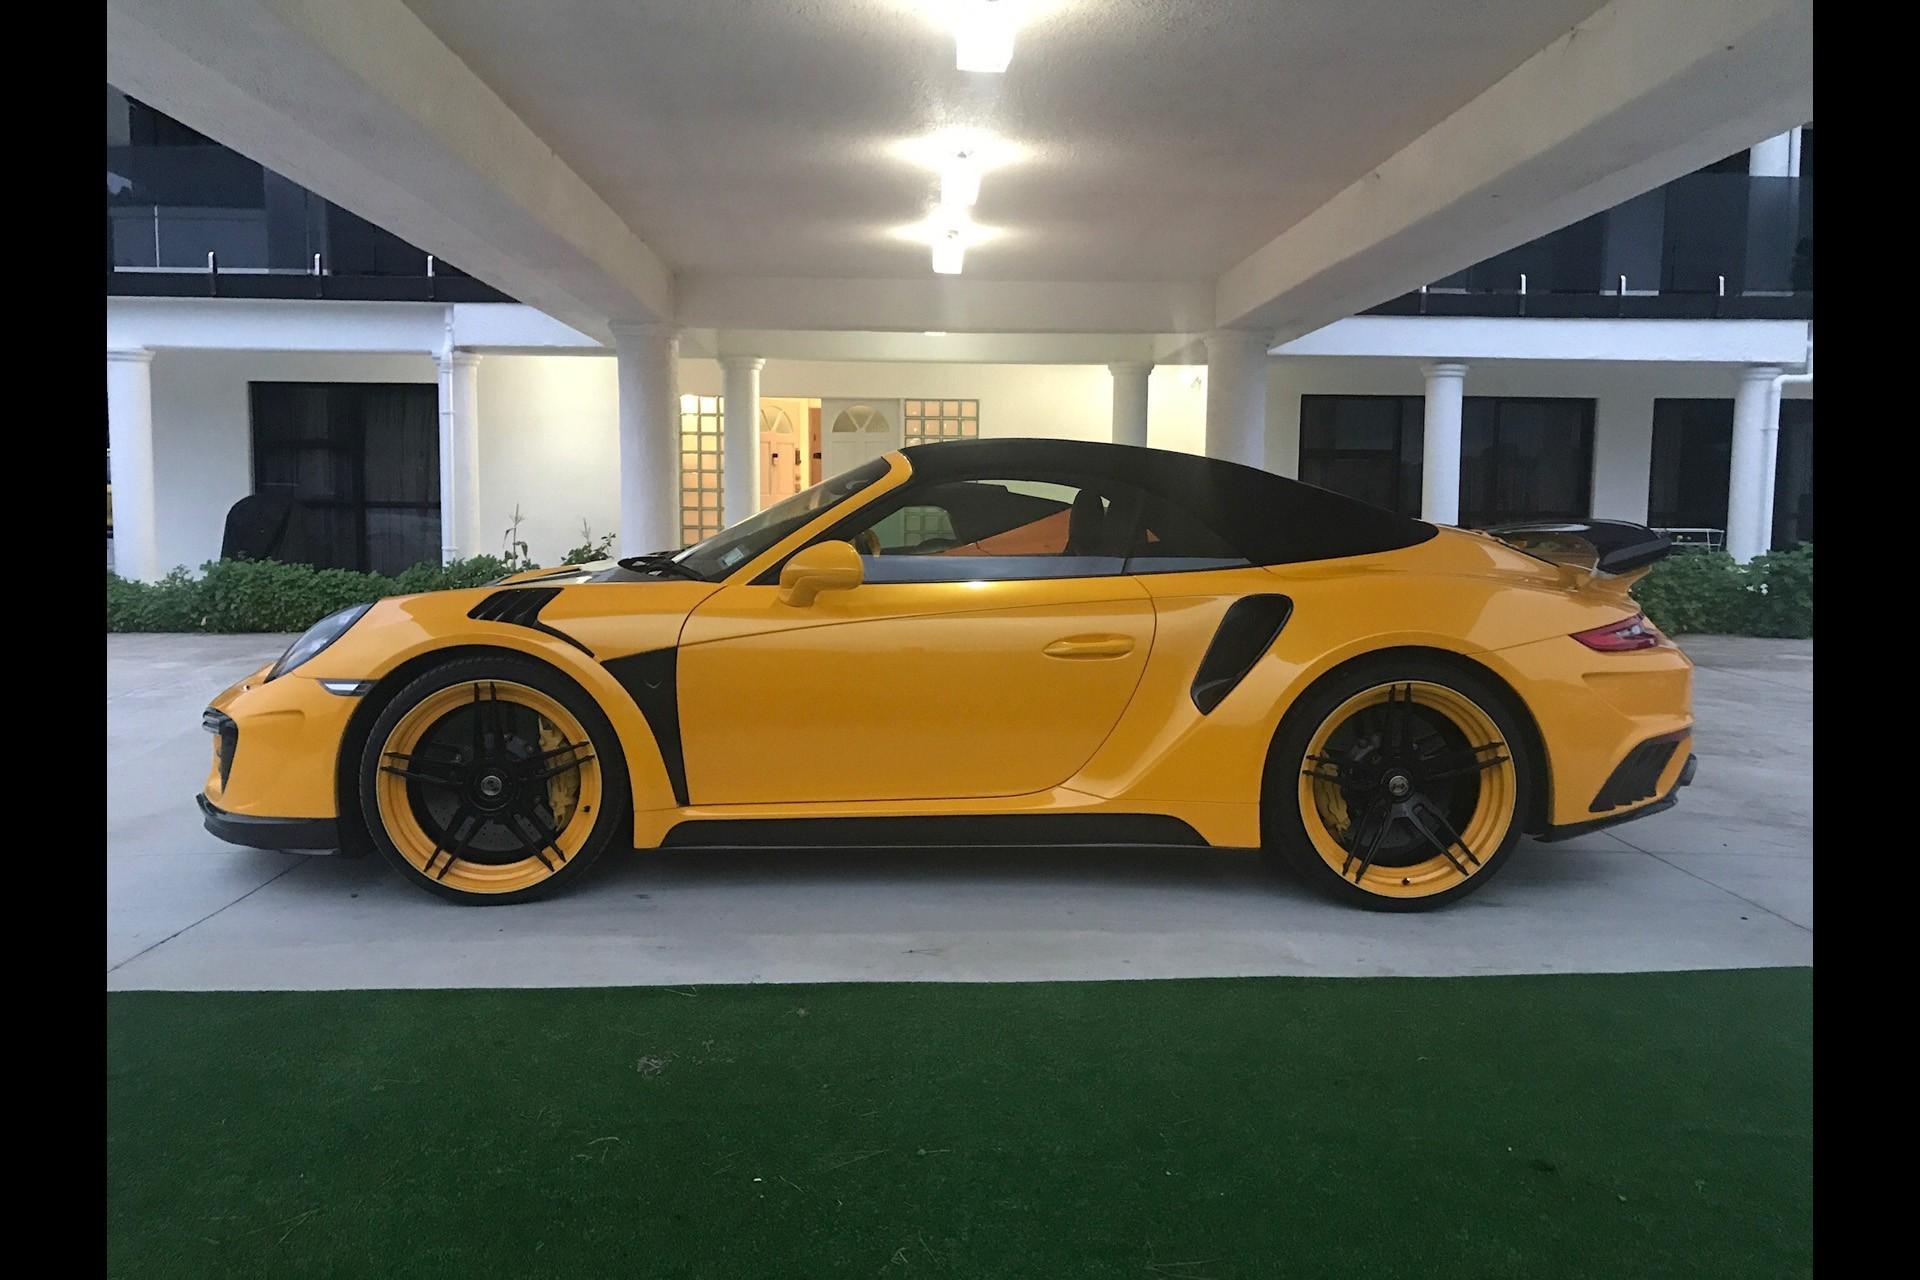 topcar carbon 2017 porsche 911 turbo s cabriolet is the. Black Bedroom Furniture Sets. Home Design Ideas